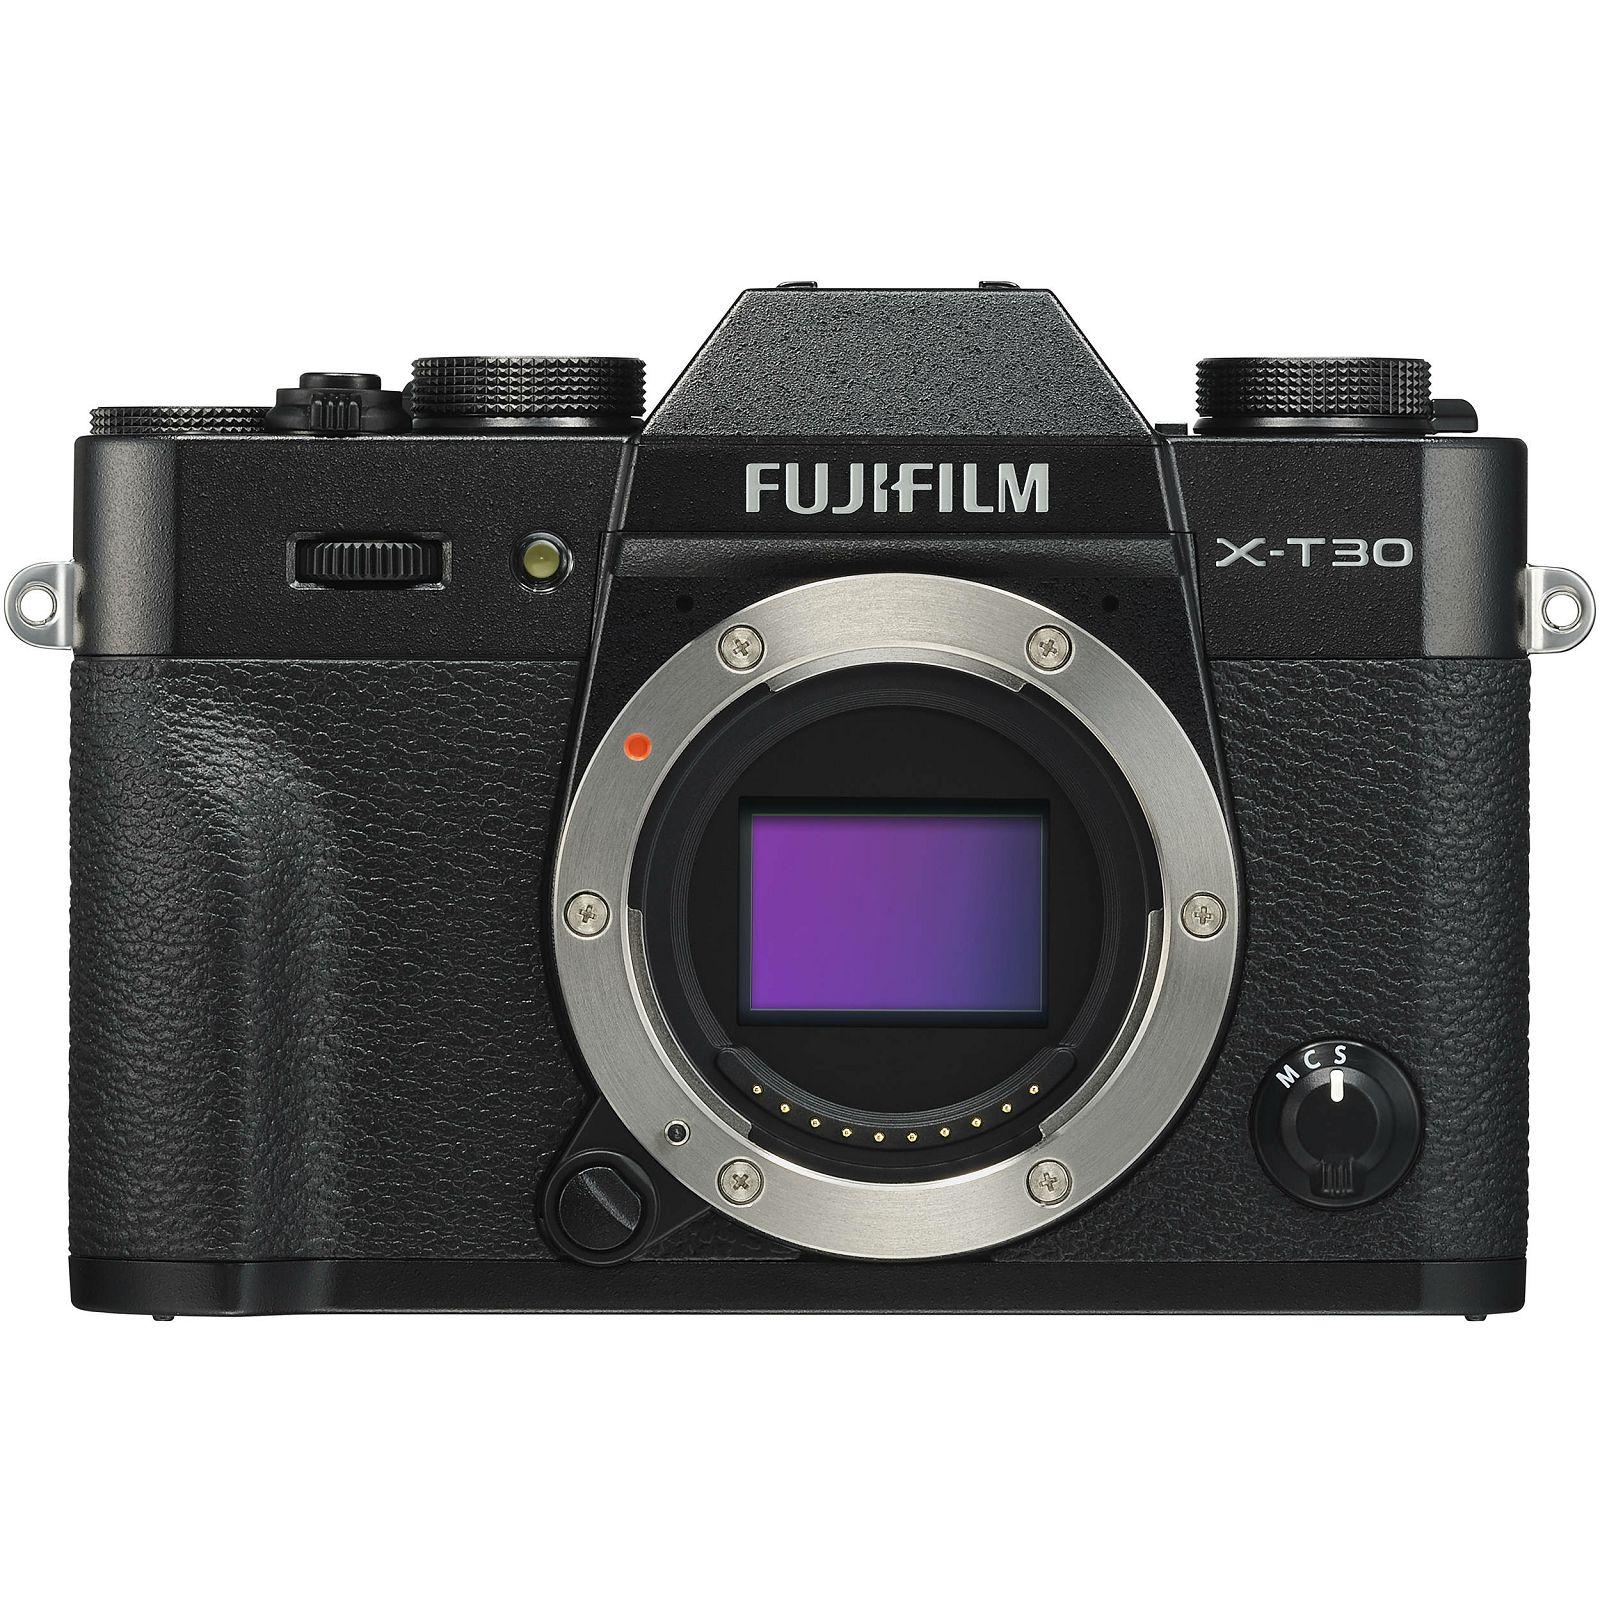 Fujifilm X-T30 Body Black crni Digitalni fotoaparat Mirrorless camera Fuji Finepix (16619566)